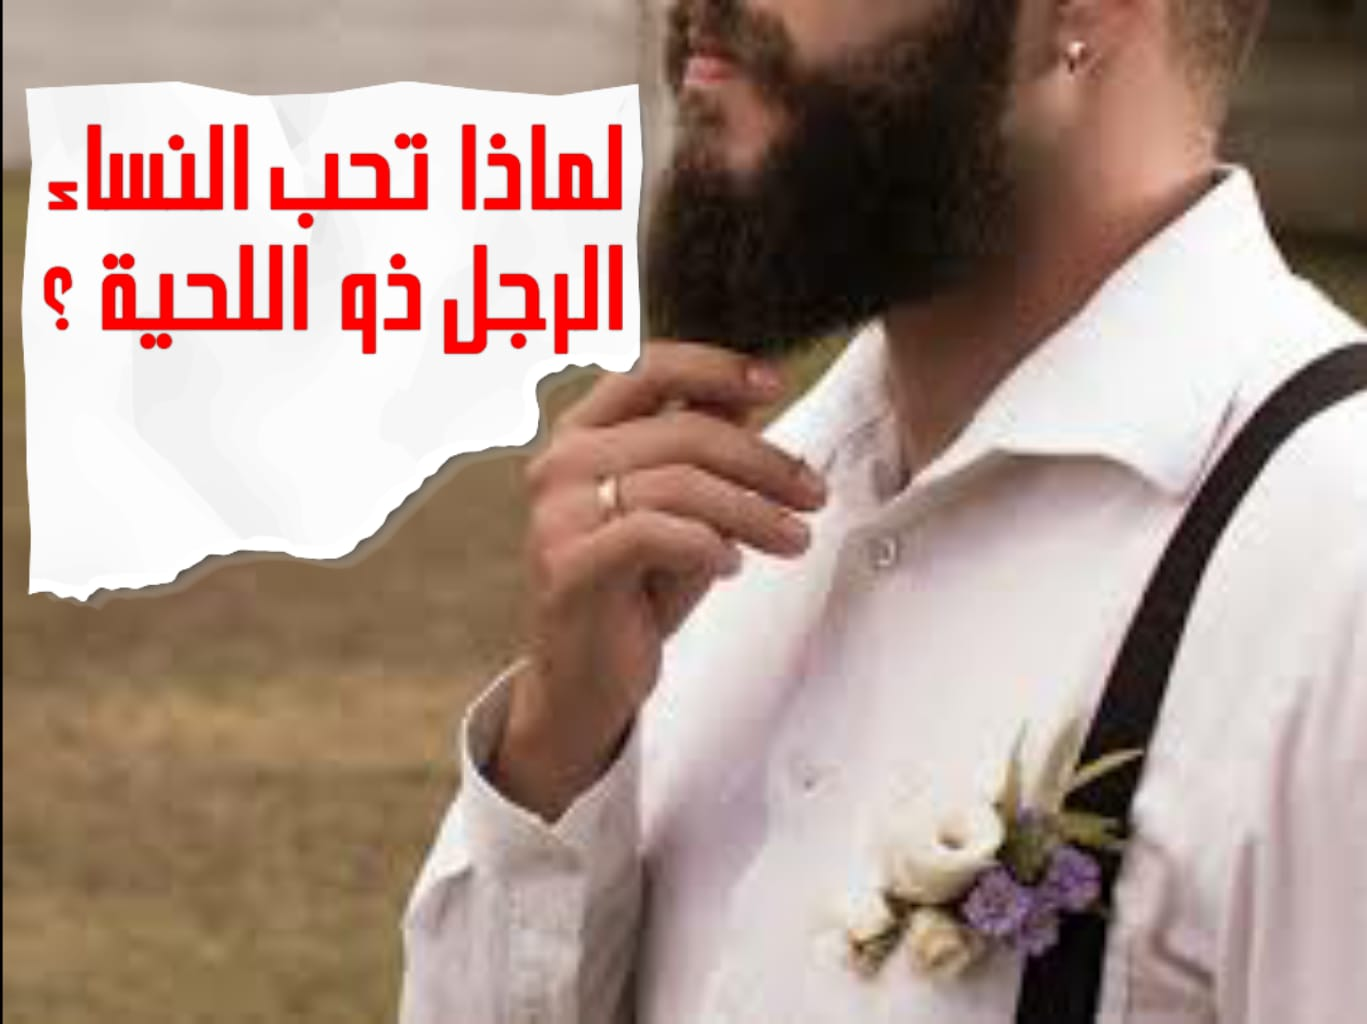 WhatsApp Image 2020 06 11 at 6.06.18 PM - لماذا النساء تحب لحية الرجل ؟؟ إليك اقوى 10 أسباب